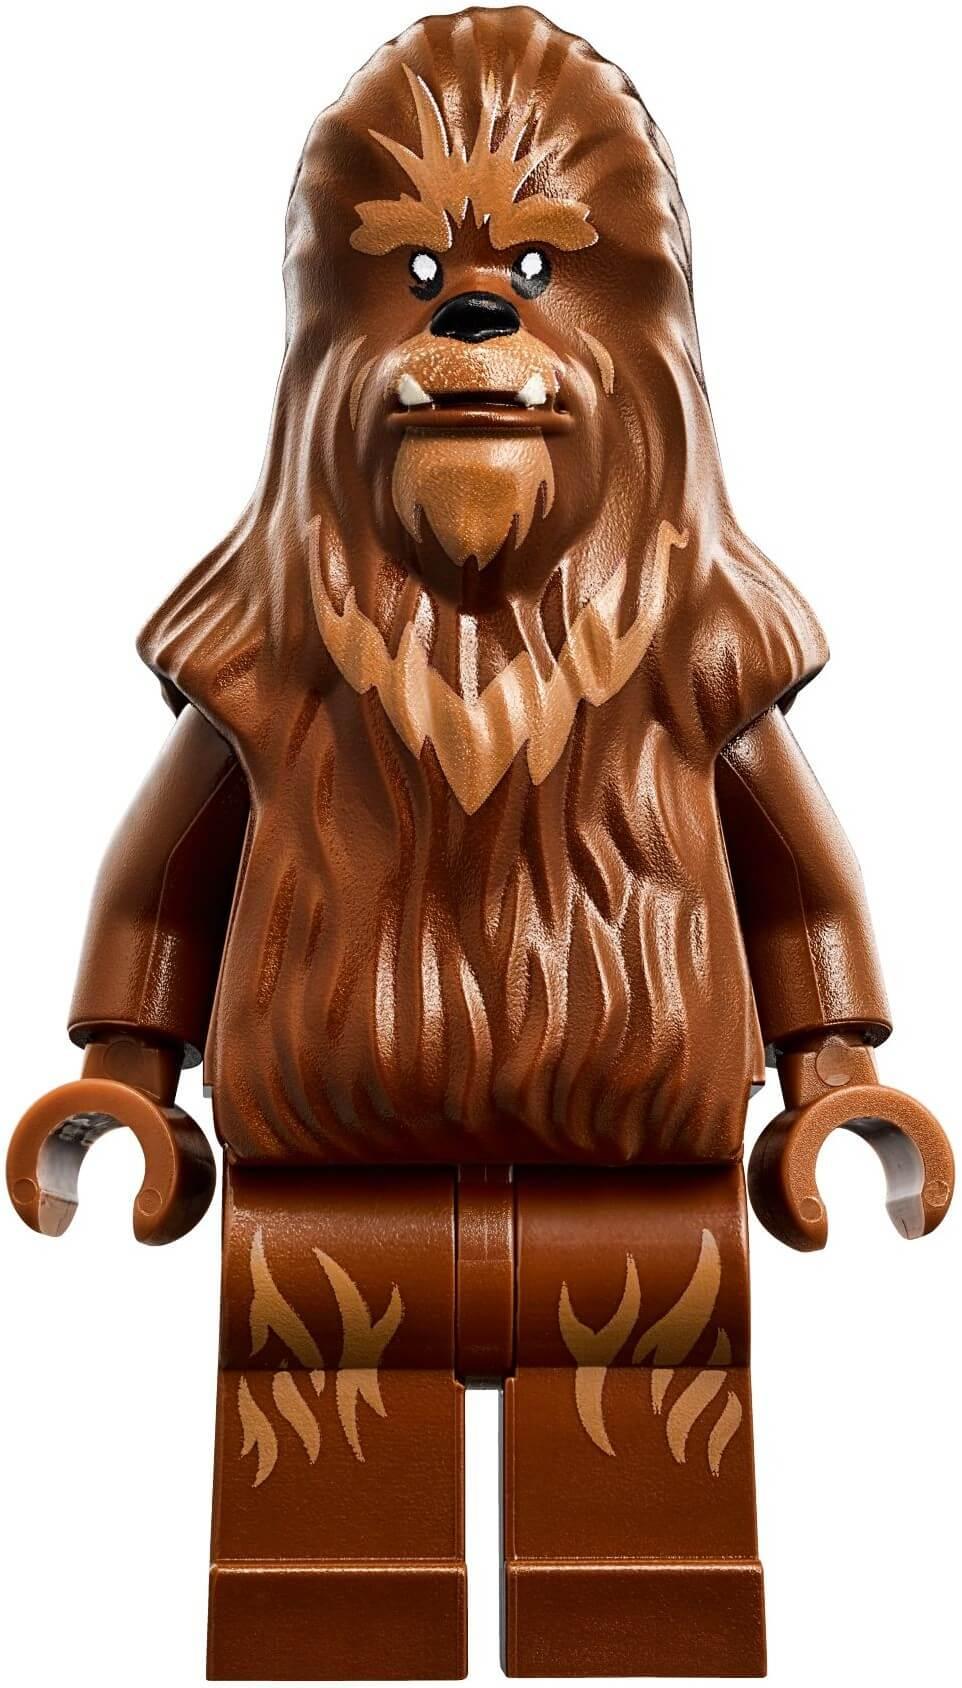 Mua đồ chơi LEGO 75129 - LEGO Star Wars 75129 - Tàu Súng Wookie thu nhỏ (LEGO Star Wars Wookiee Gunship 75129)